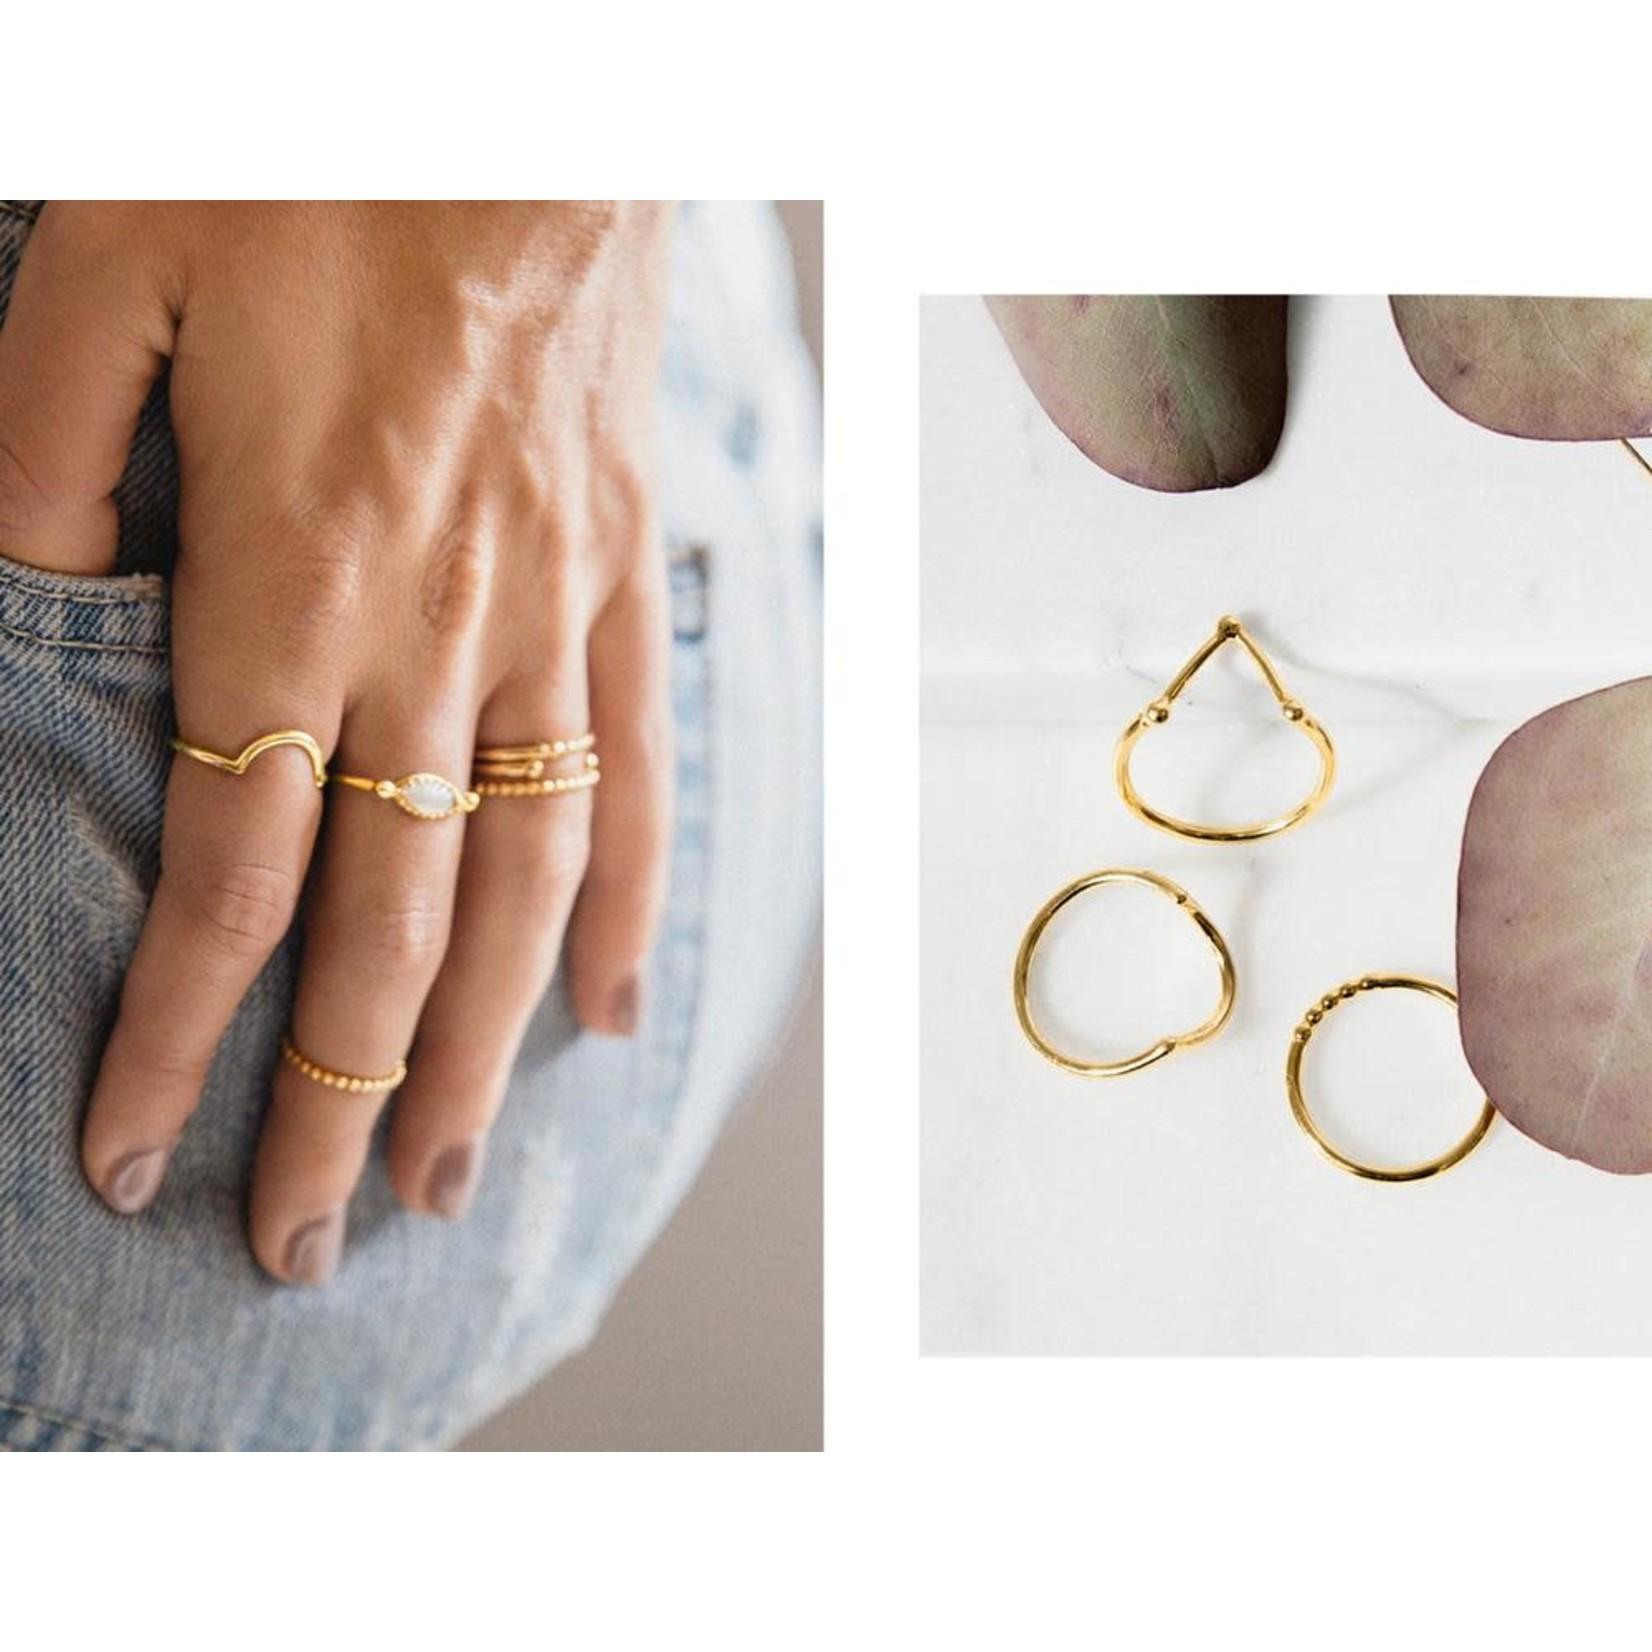 Welldunn jewelry Welldunn bague SIERRA or